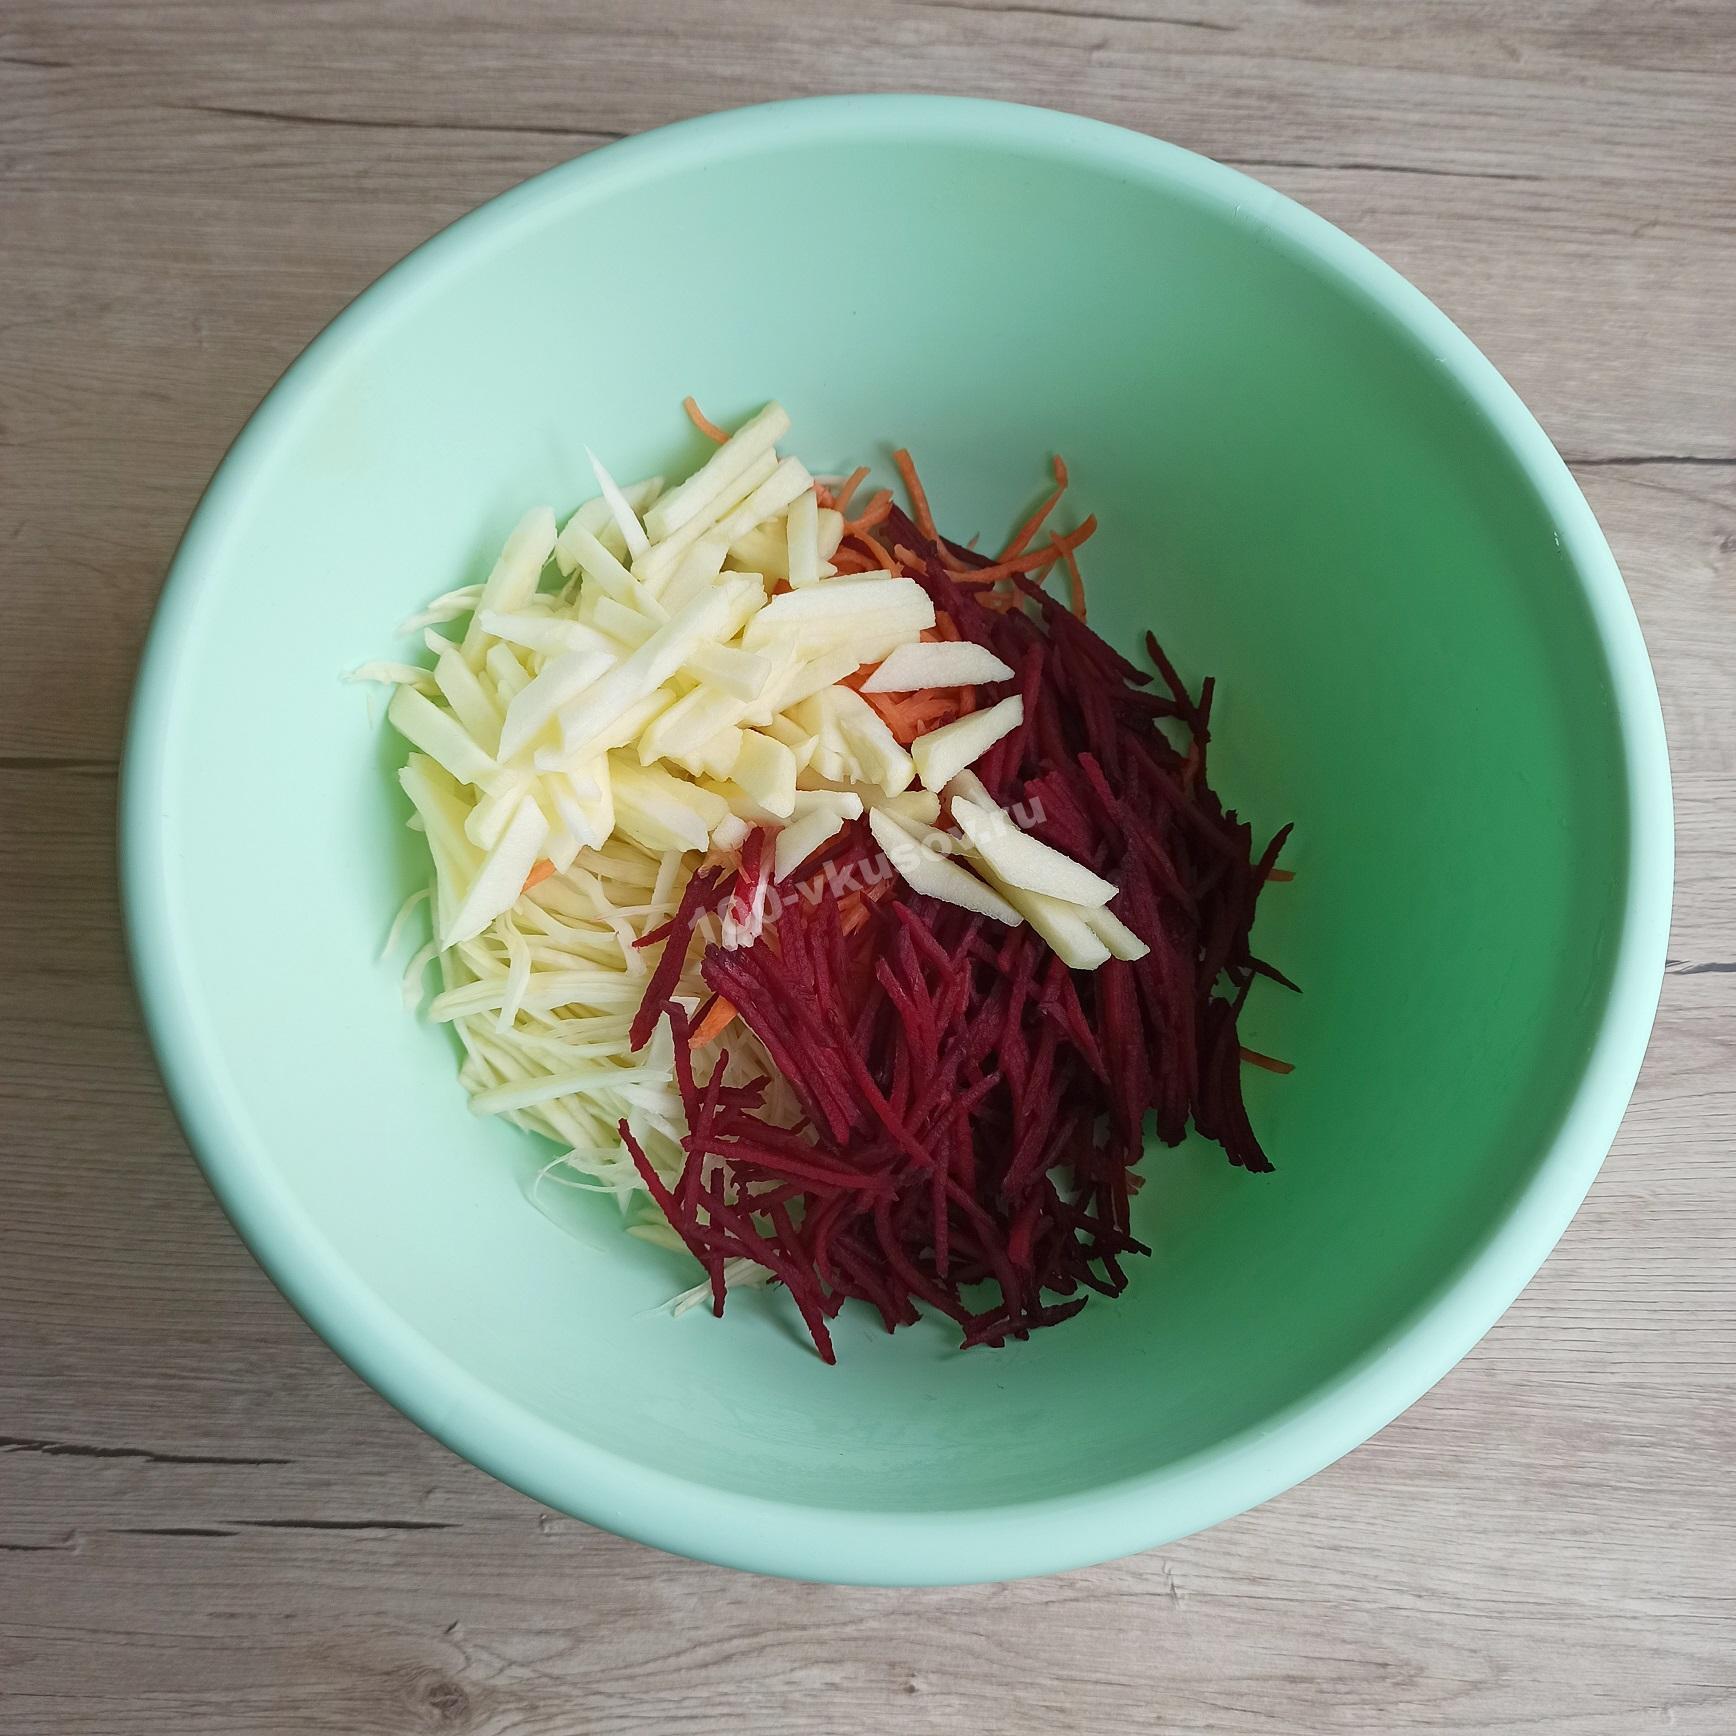 Смешиваем ингредиенты для салата Метелка